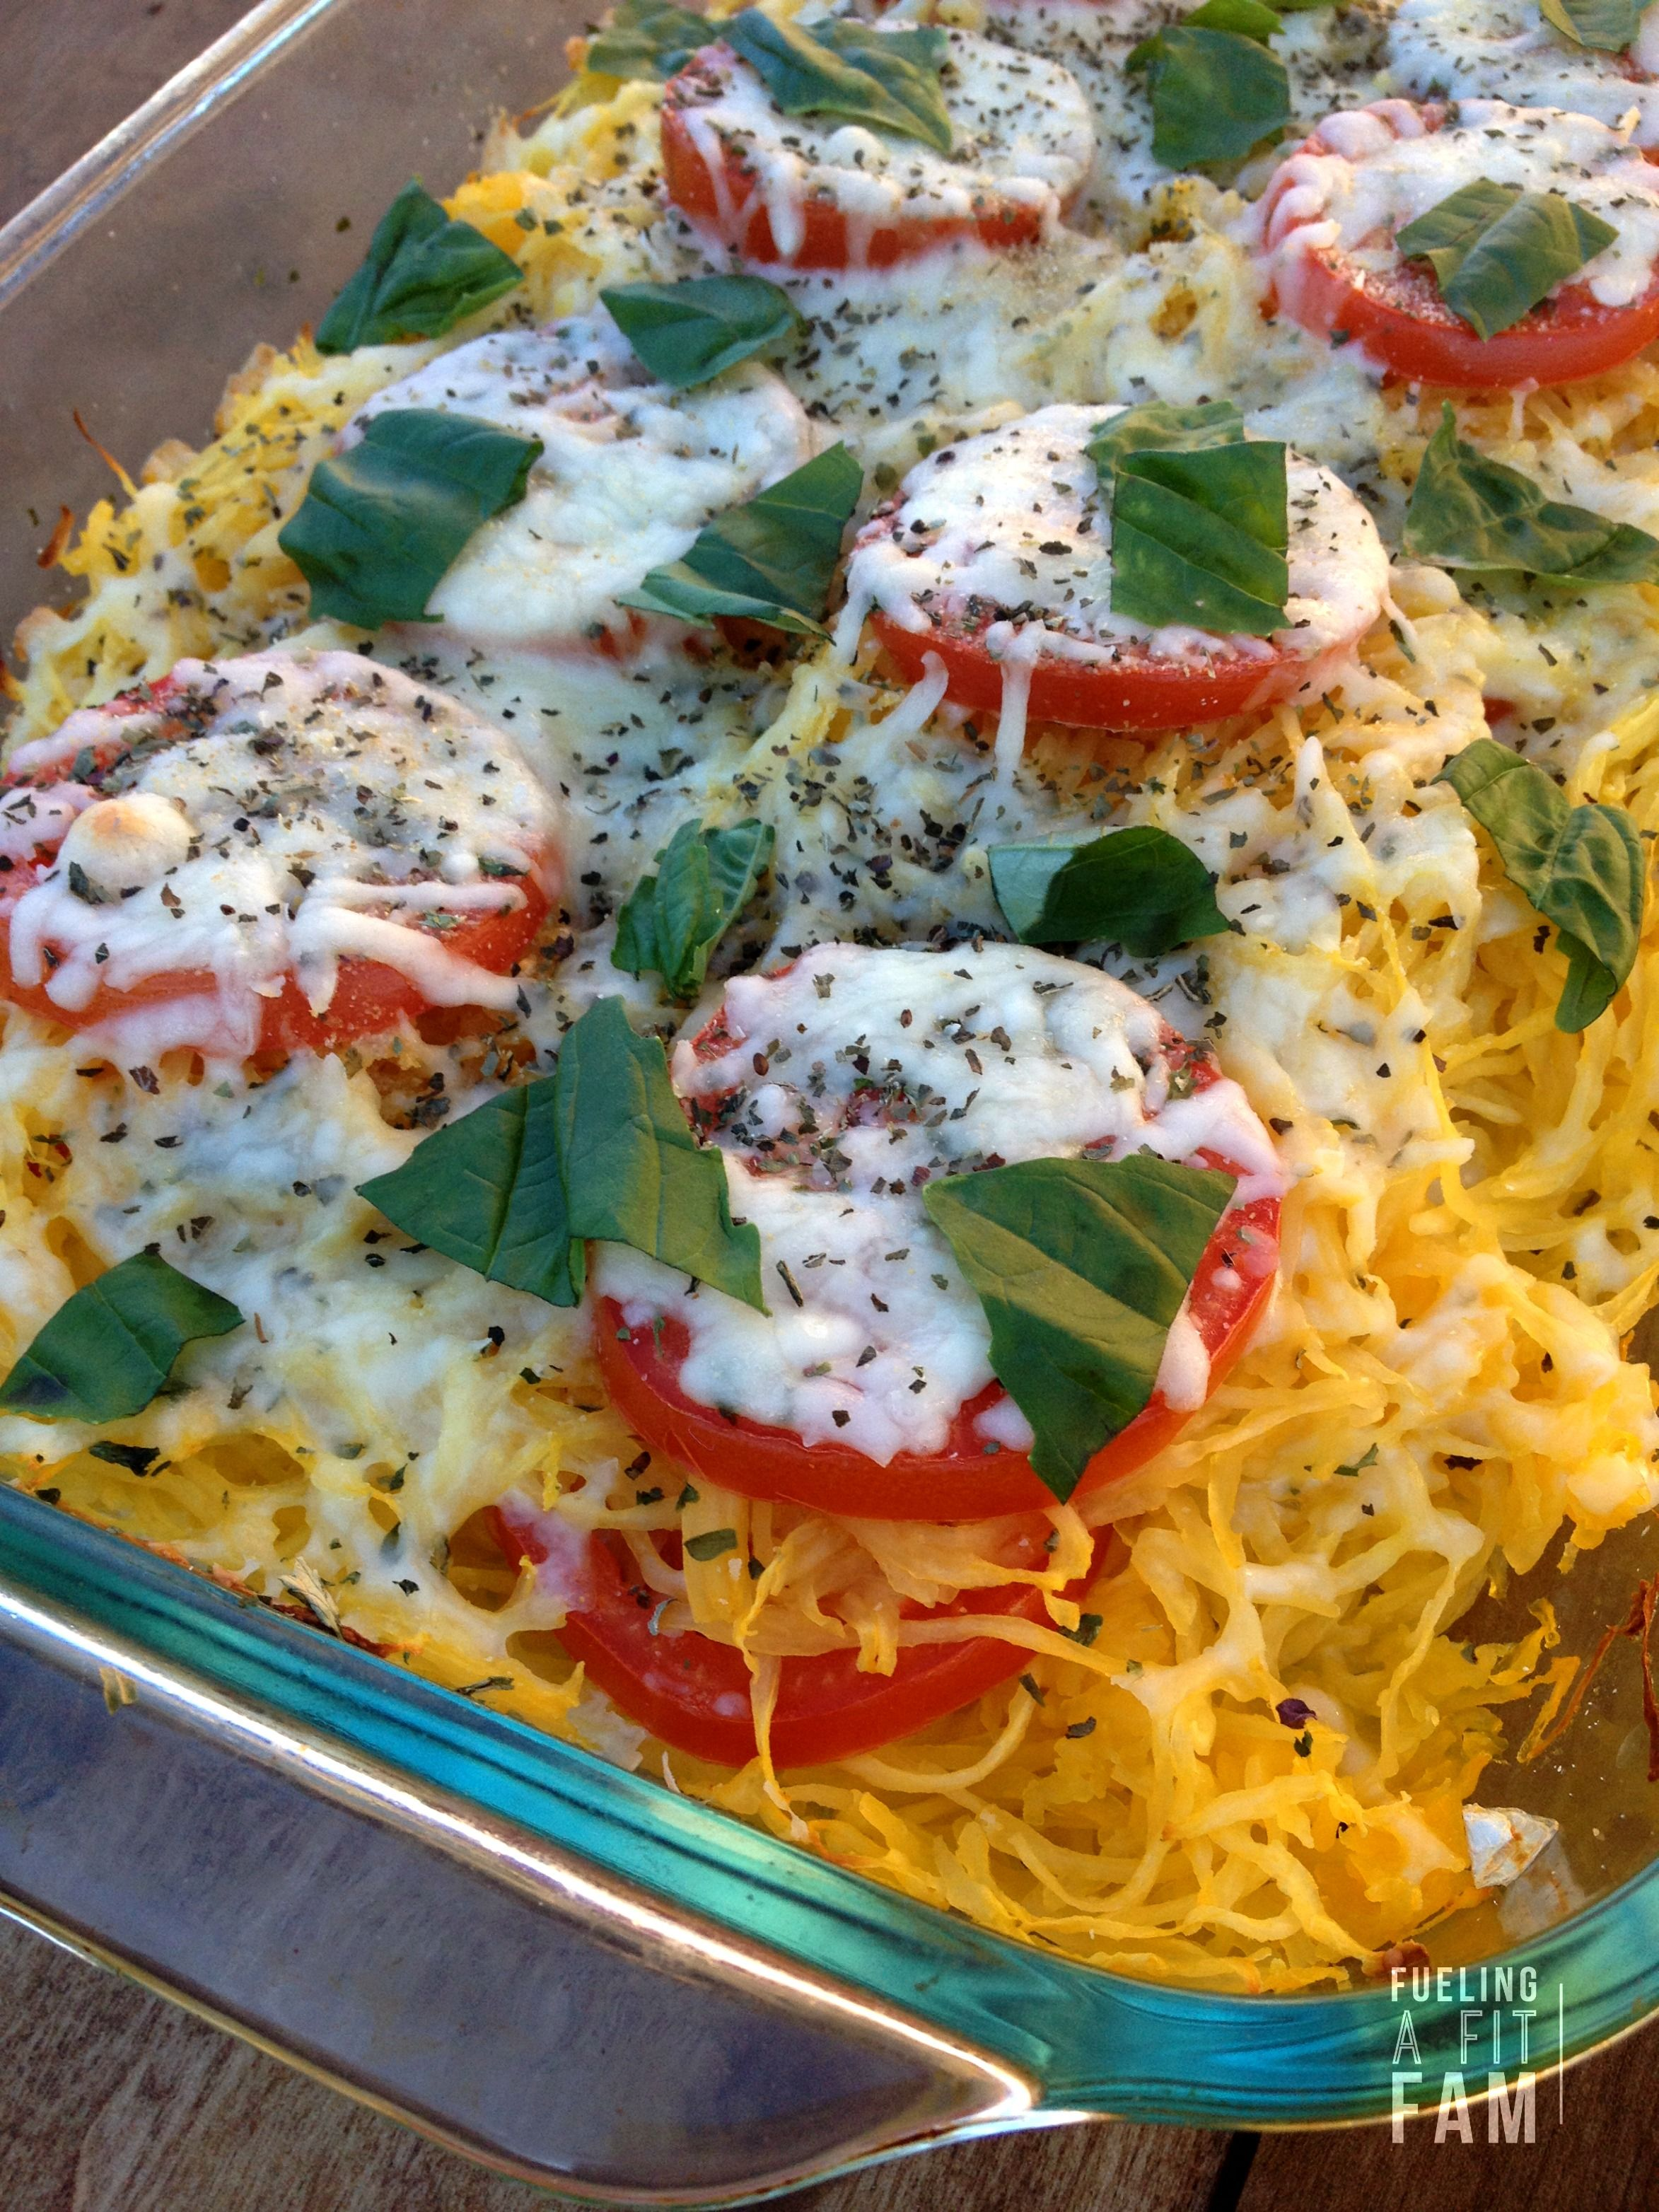 Tomato Basil Spaghetti Squash Bake - Fueling a Fit Fam #spagettisquashrecipes